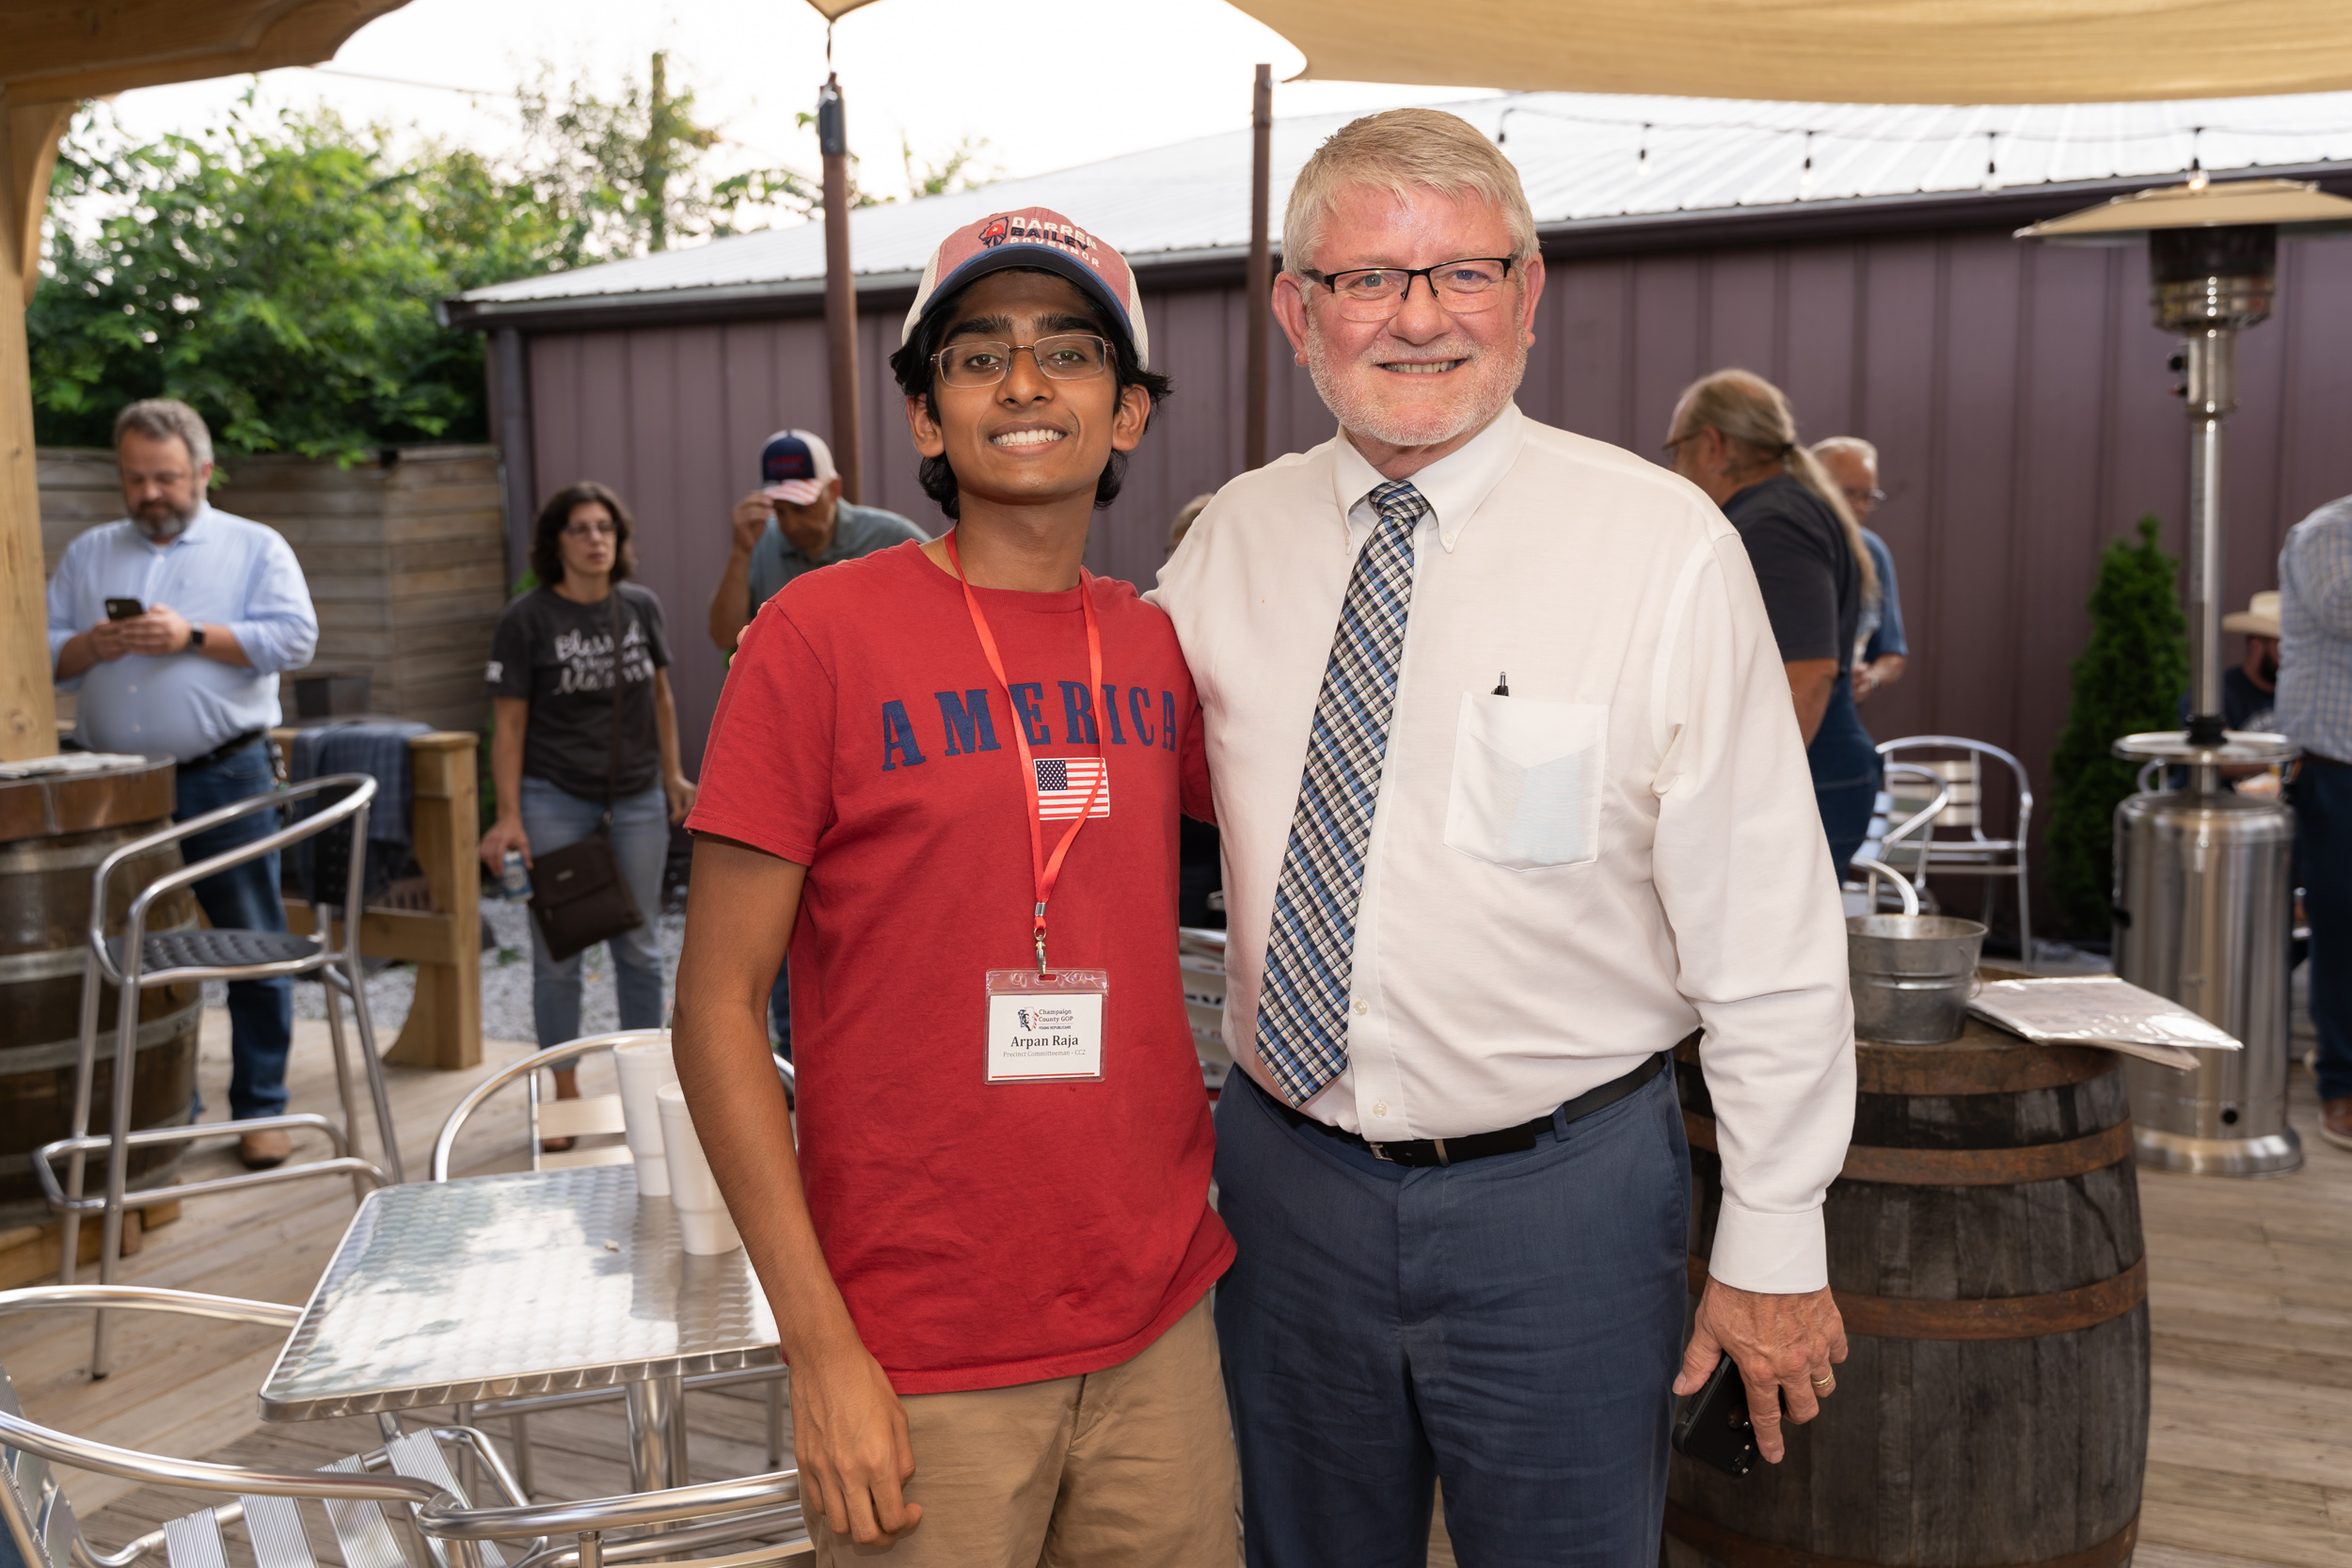 Champaign County, IL Young Republican Happy Hour